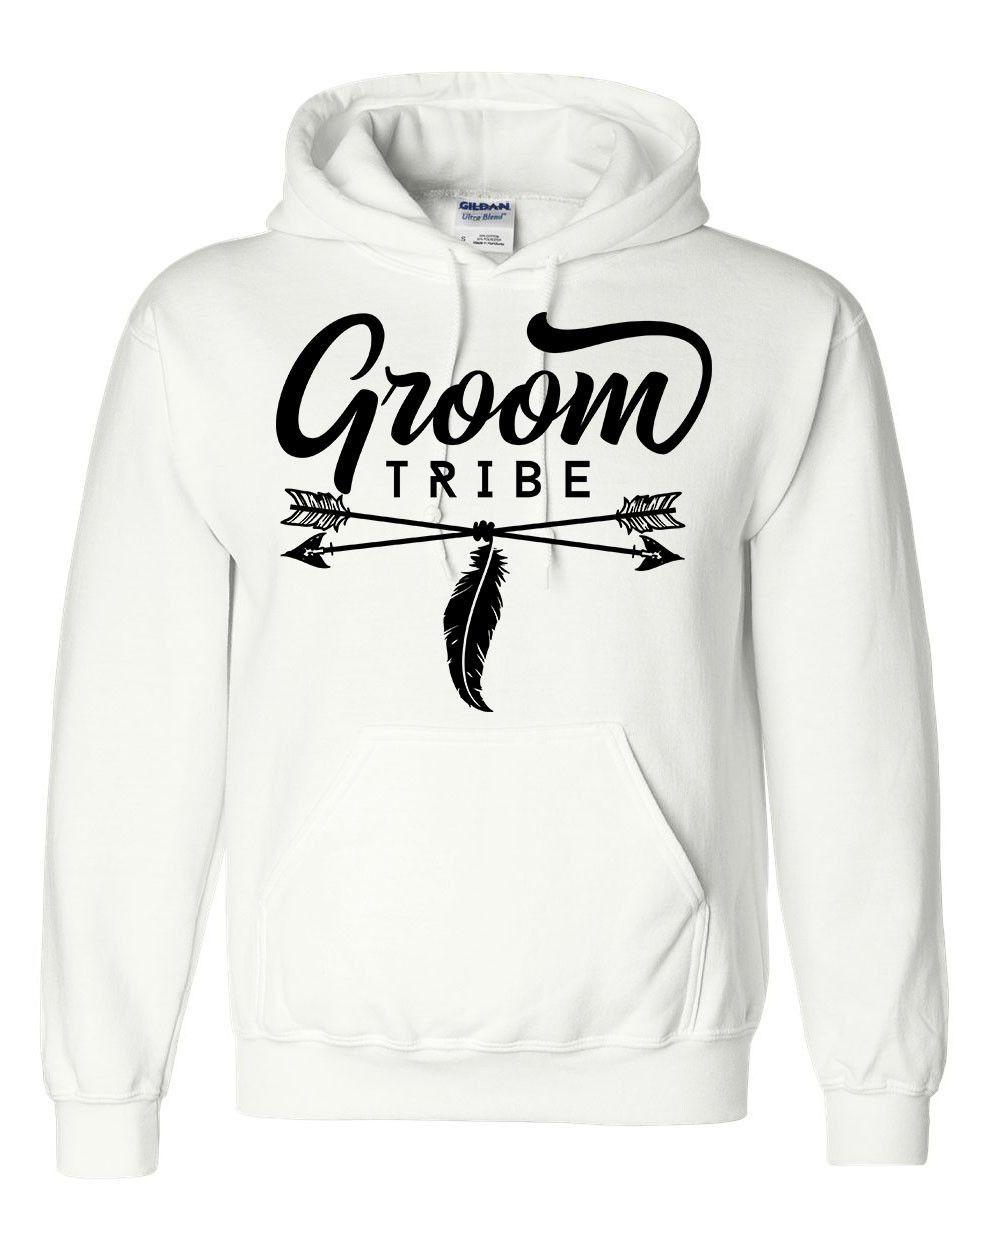 Wedding Gift From Groomsmen: Groom Tribe Hoodie Groomsman Bachelor Party Sweatshirt